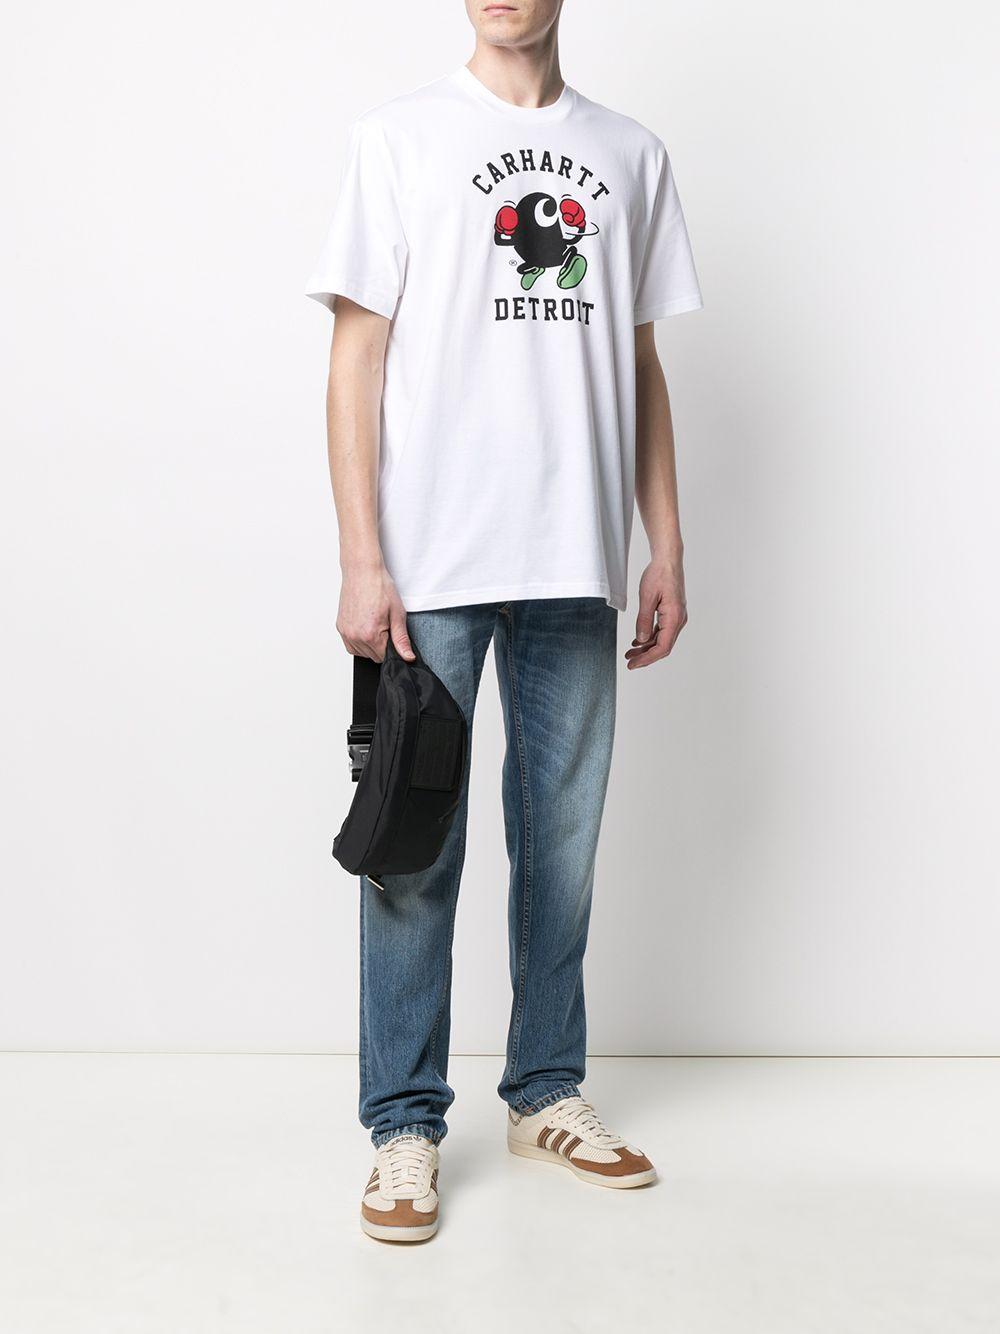 boxing t-shirt man white in cotton CARHARTT WIP | T-shirts | I02902602.00